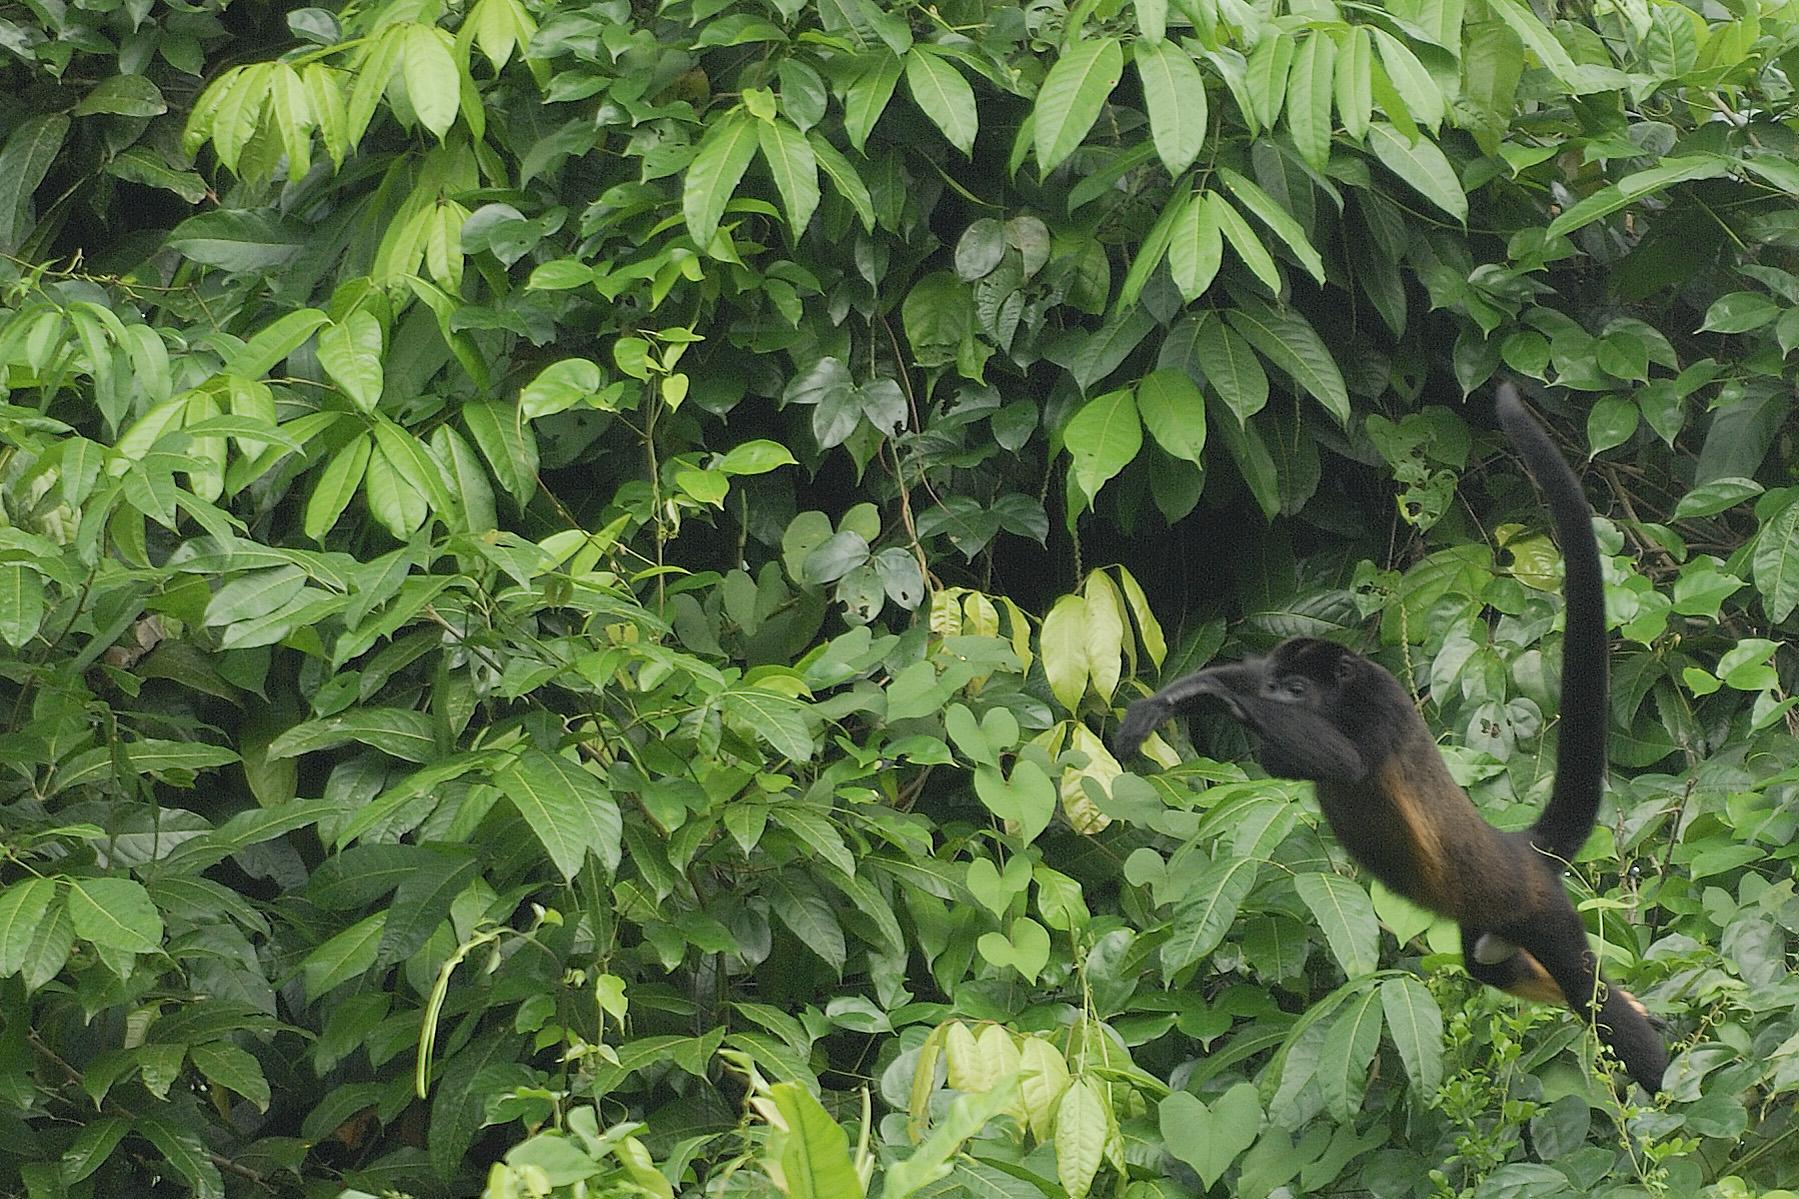 20070630 - Costa Rica - 1196.jpg